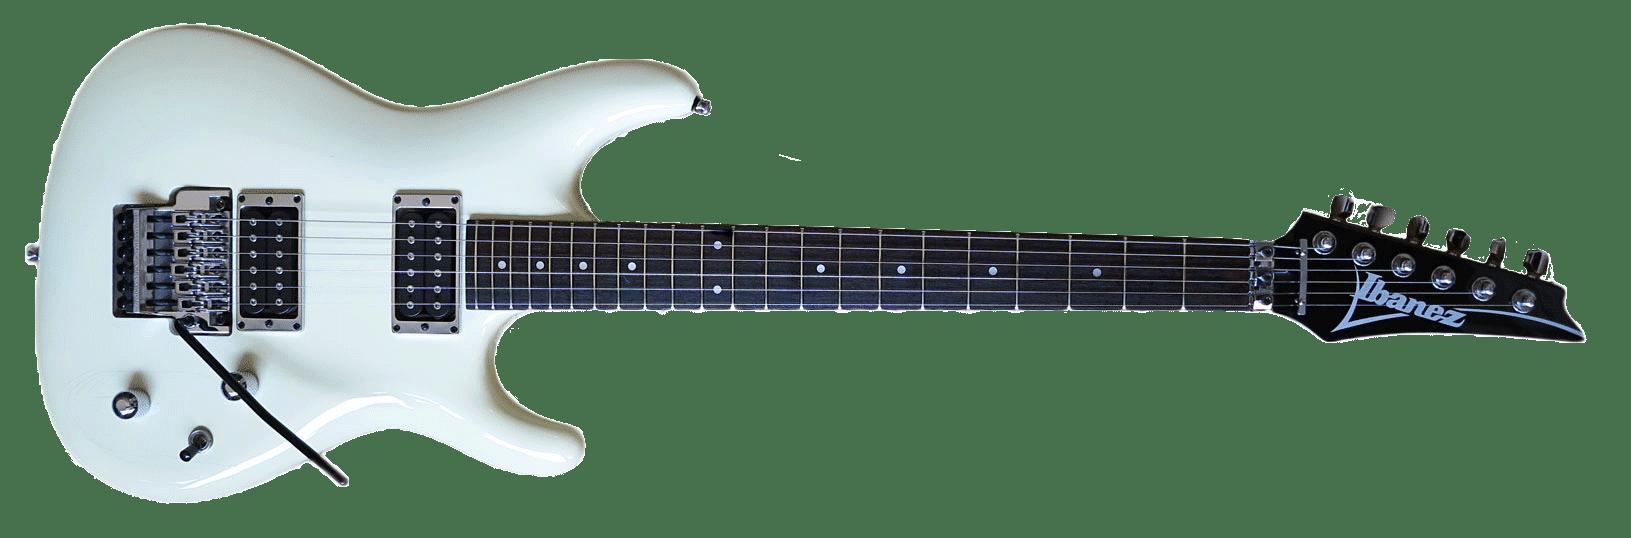 Ibanez JS1 signature Joe Satriani